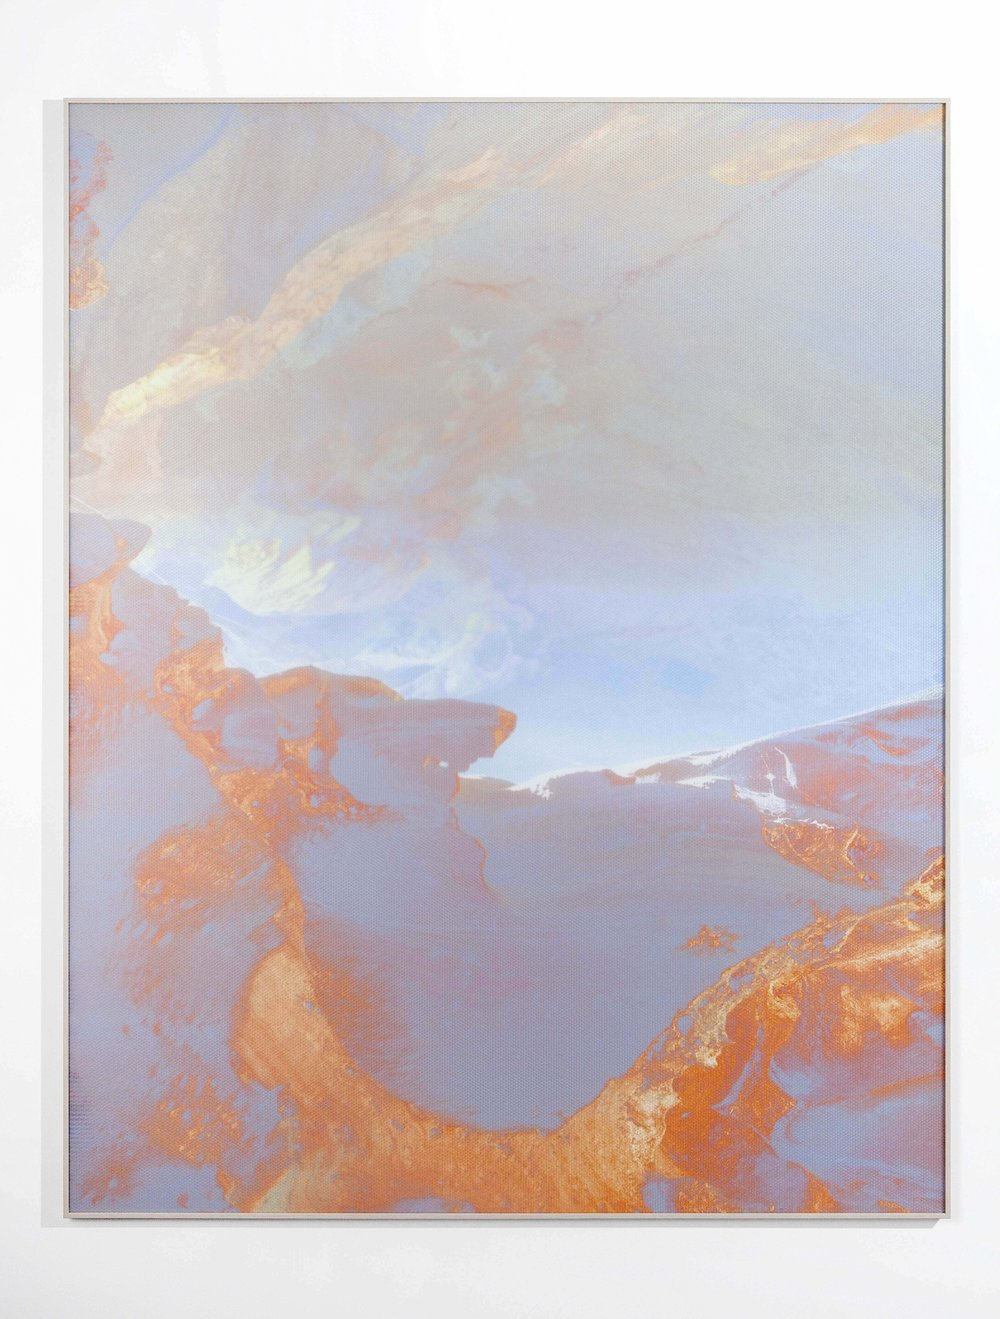 Beyond the Oecumene / Part IX,  2019 Aquarelle, wax pastels, UV-print on aluminium beneath marbled Plexiglas 190 x 150 cm (75 x 59 in)